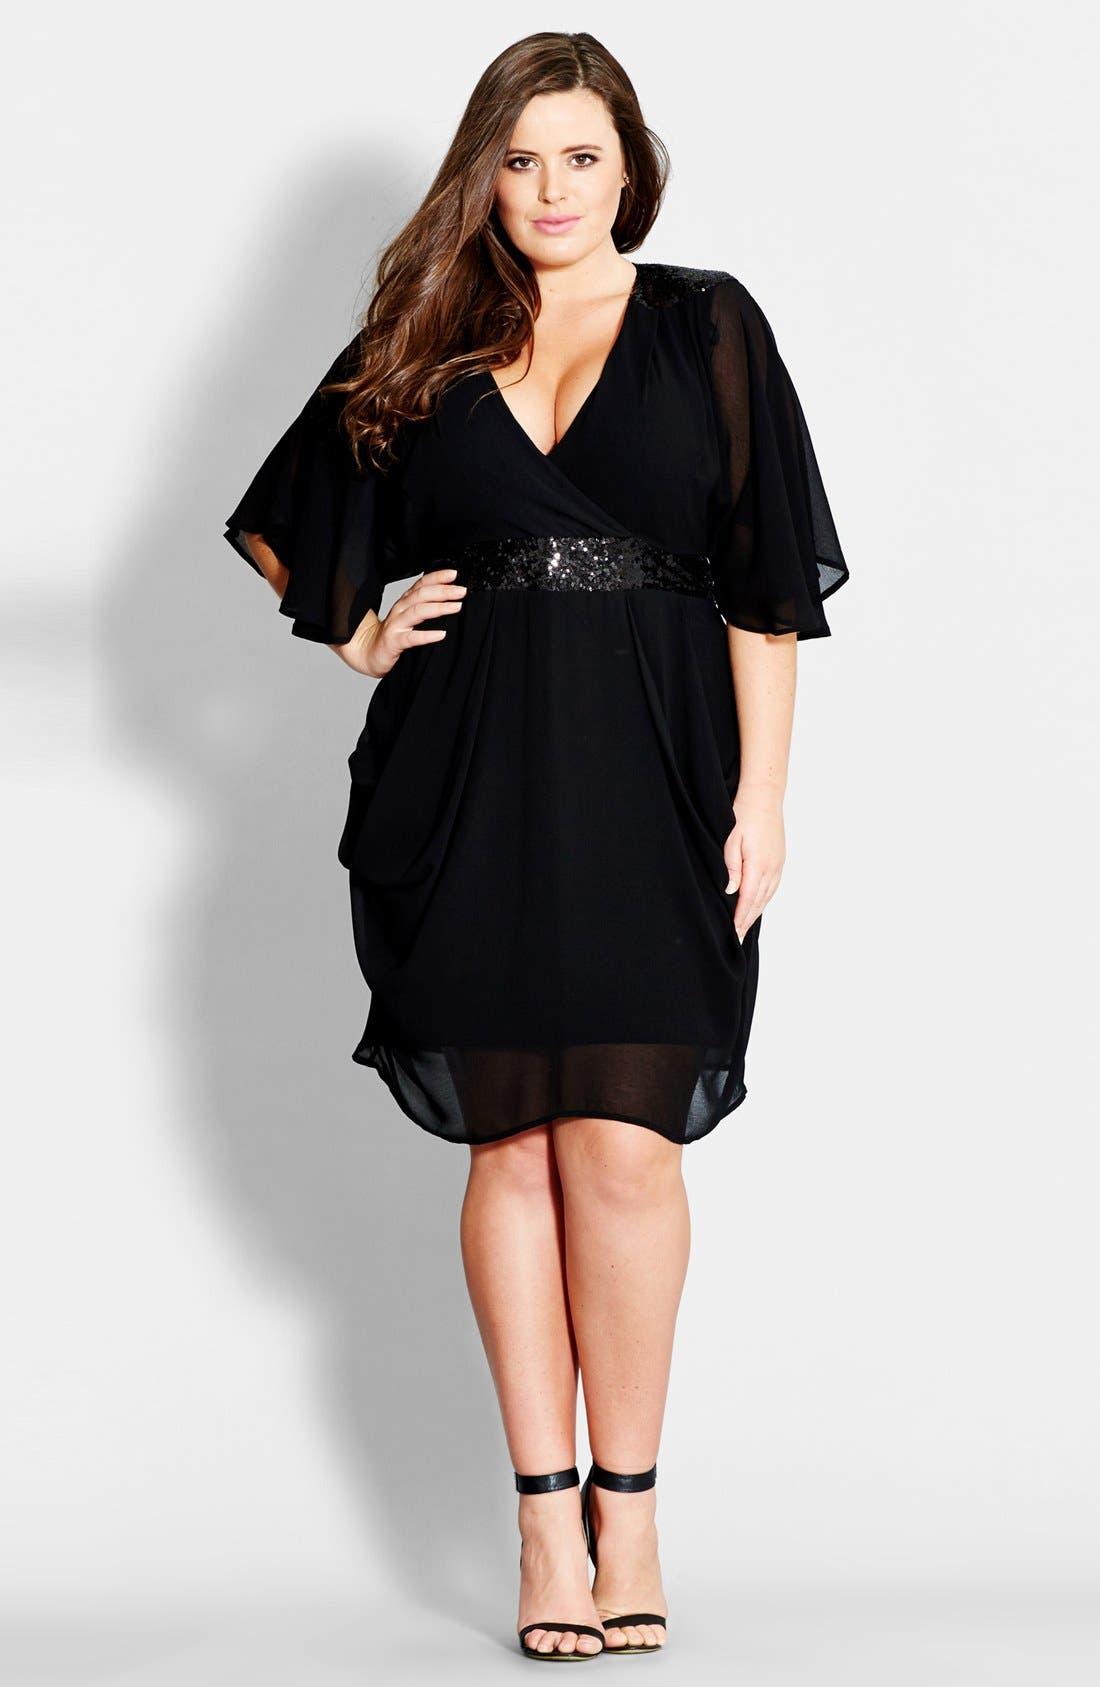 Alternate Image 1 Selected - City Chic Sequin Wrap Front Dress (Plus Size)